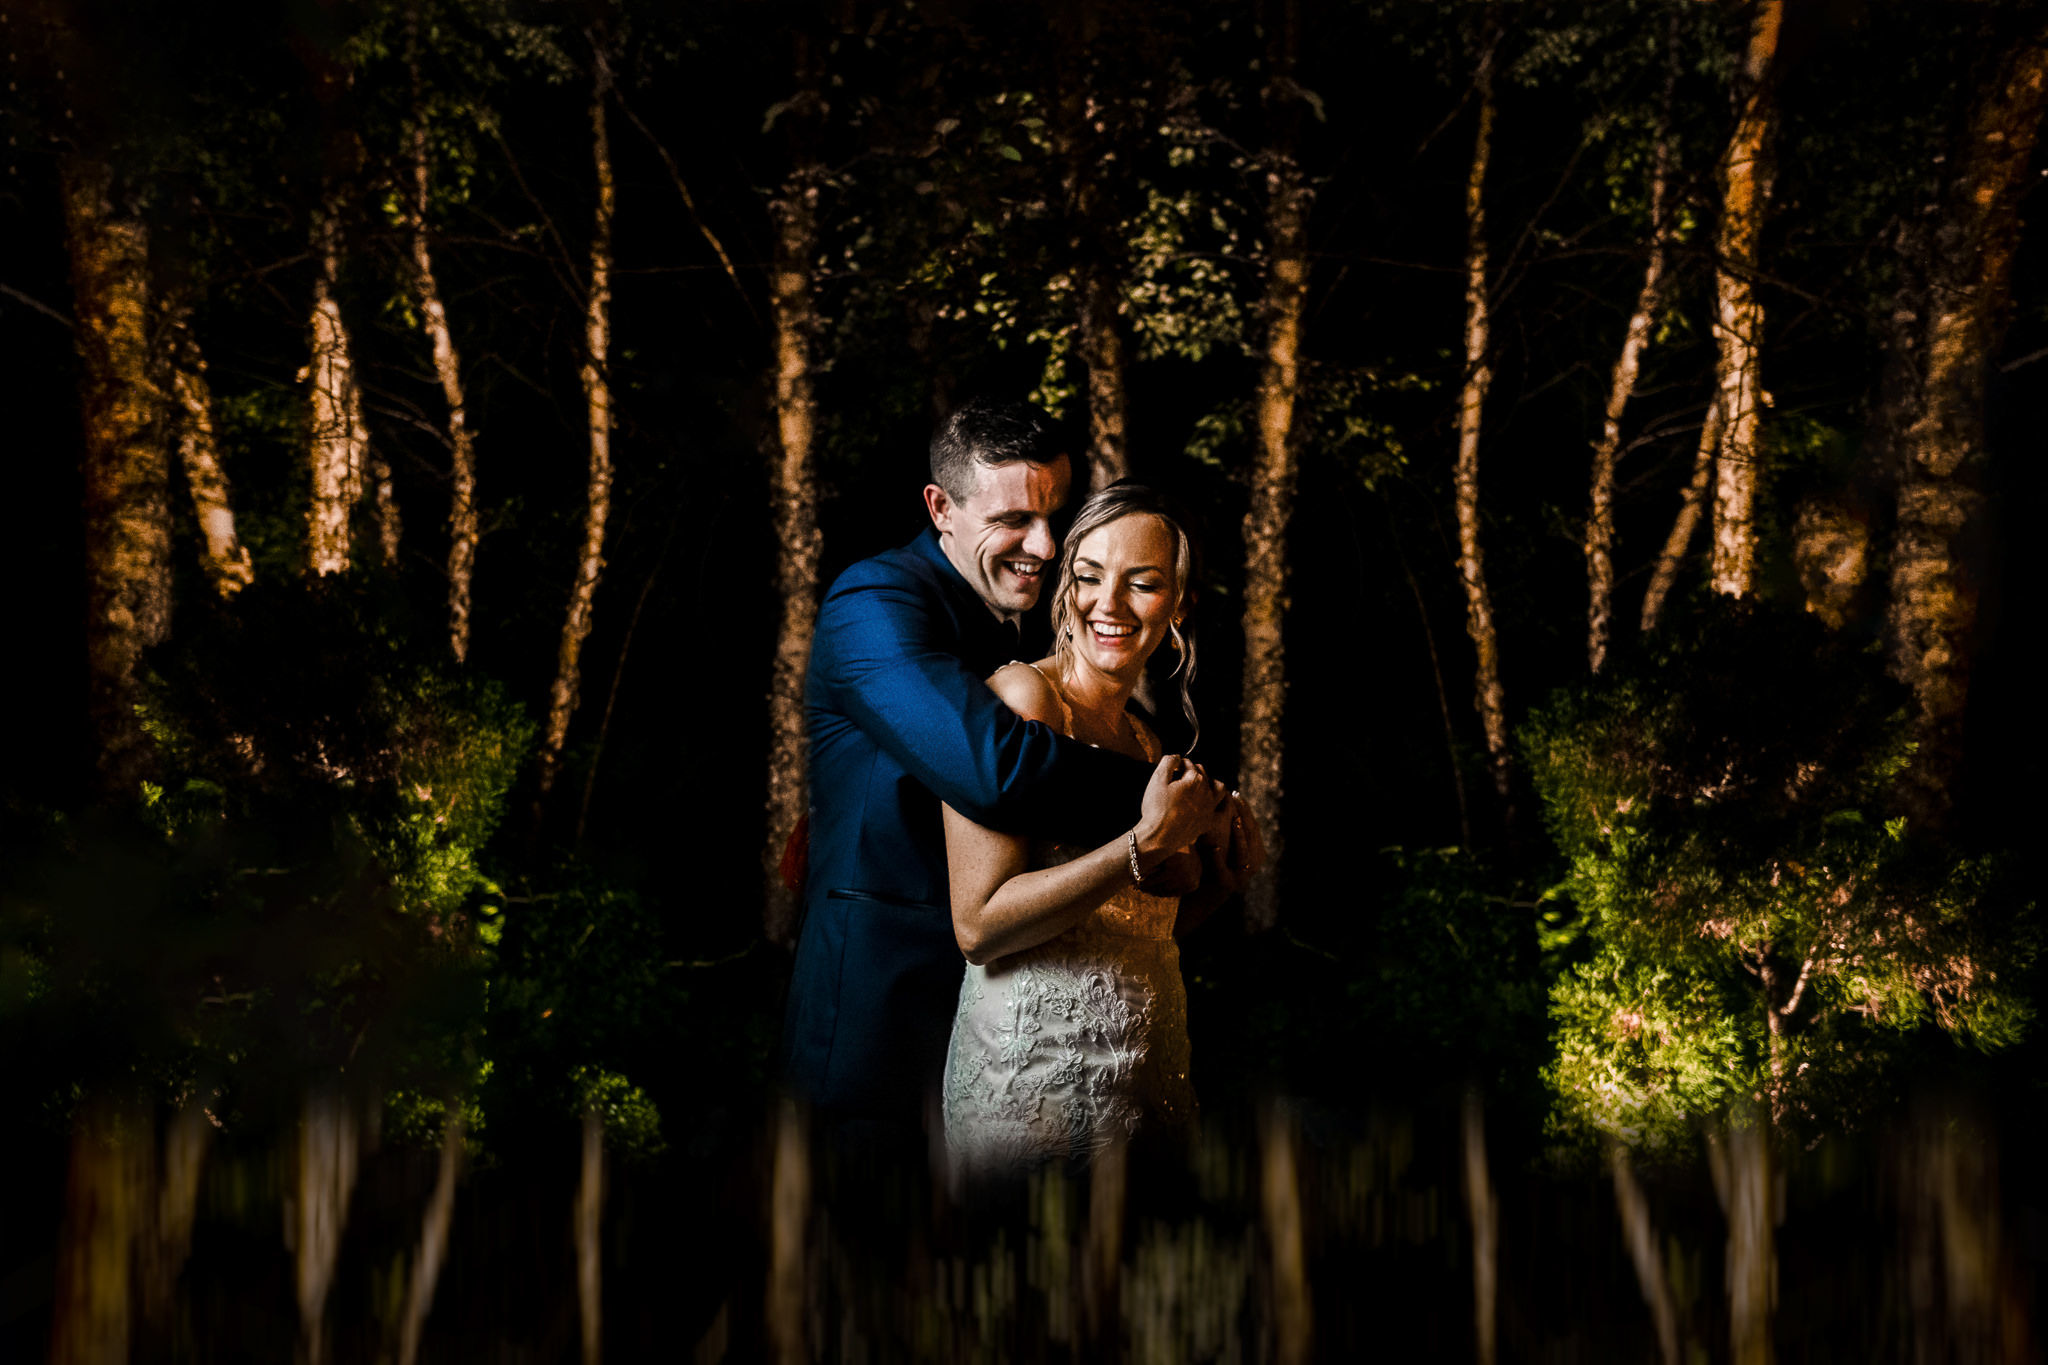 Brennan-South-Gate-Manor-New-Jersey-Wedding-Photographer-44.JPG